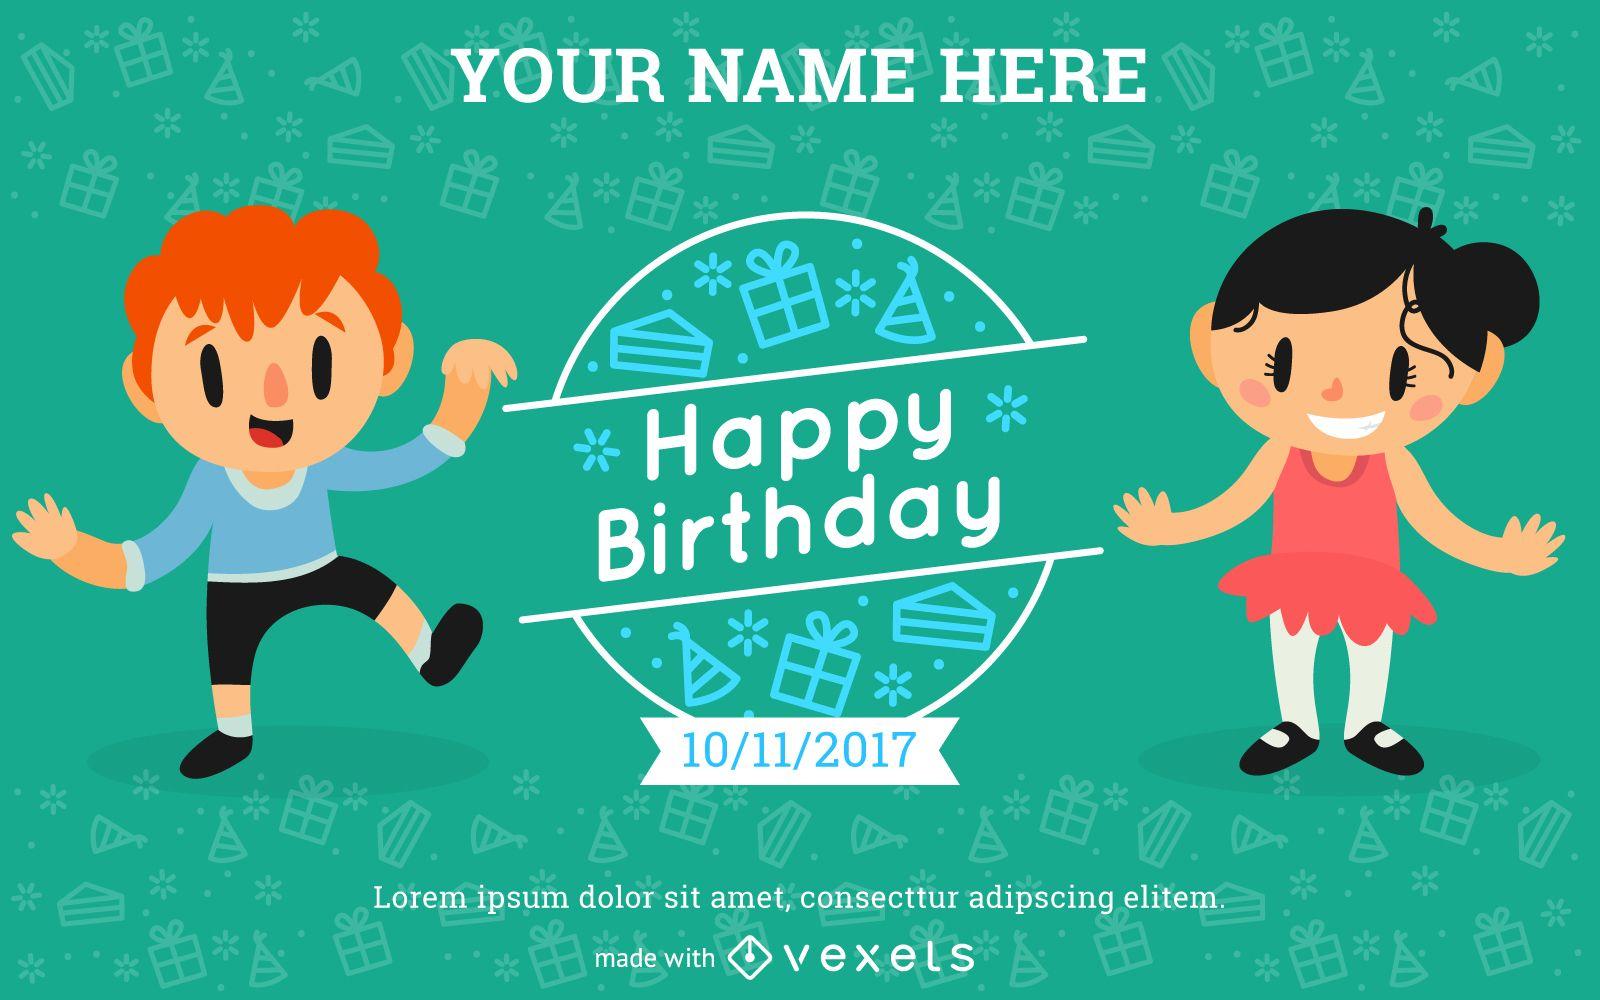 Kids Birthday Invitation Card Maker Editable design